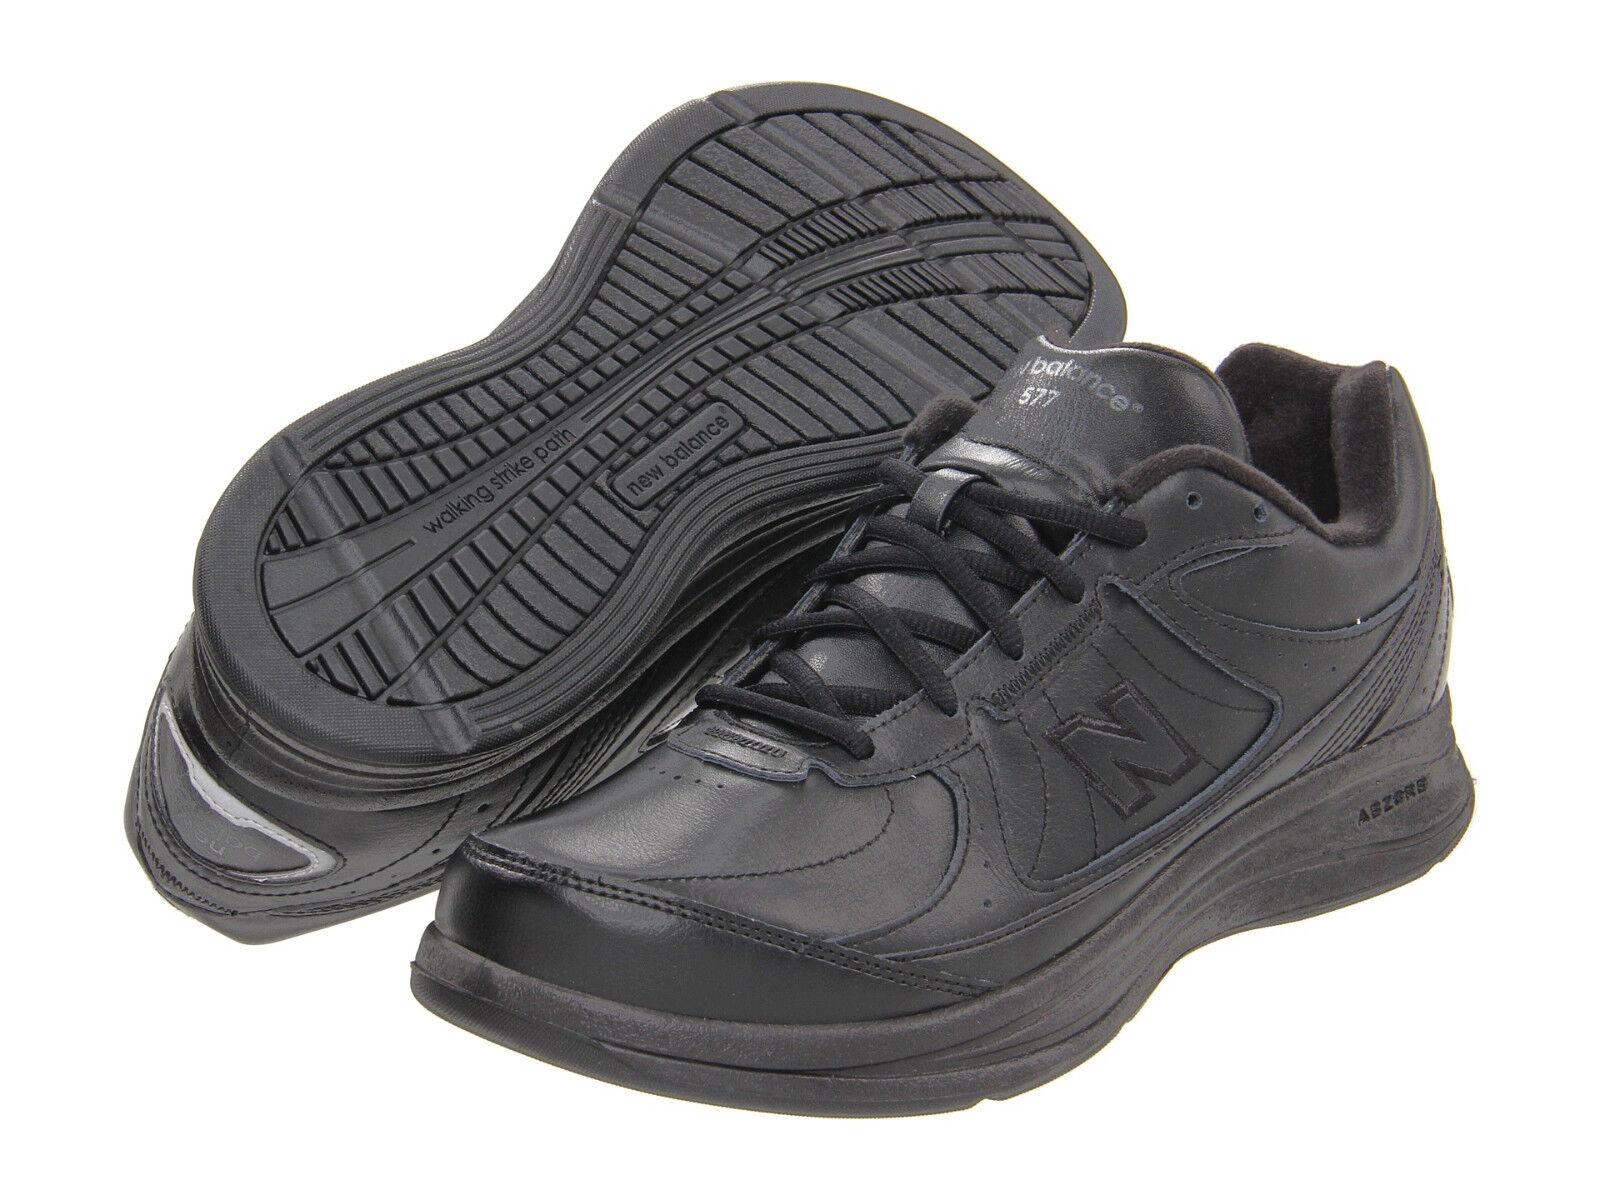 Men New Balance MW577BK Walking (Medium D) Black Black 100% Authentic Brand New